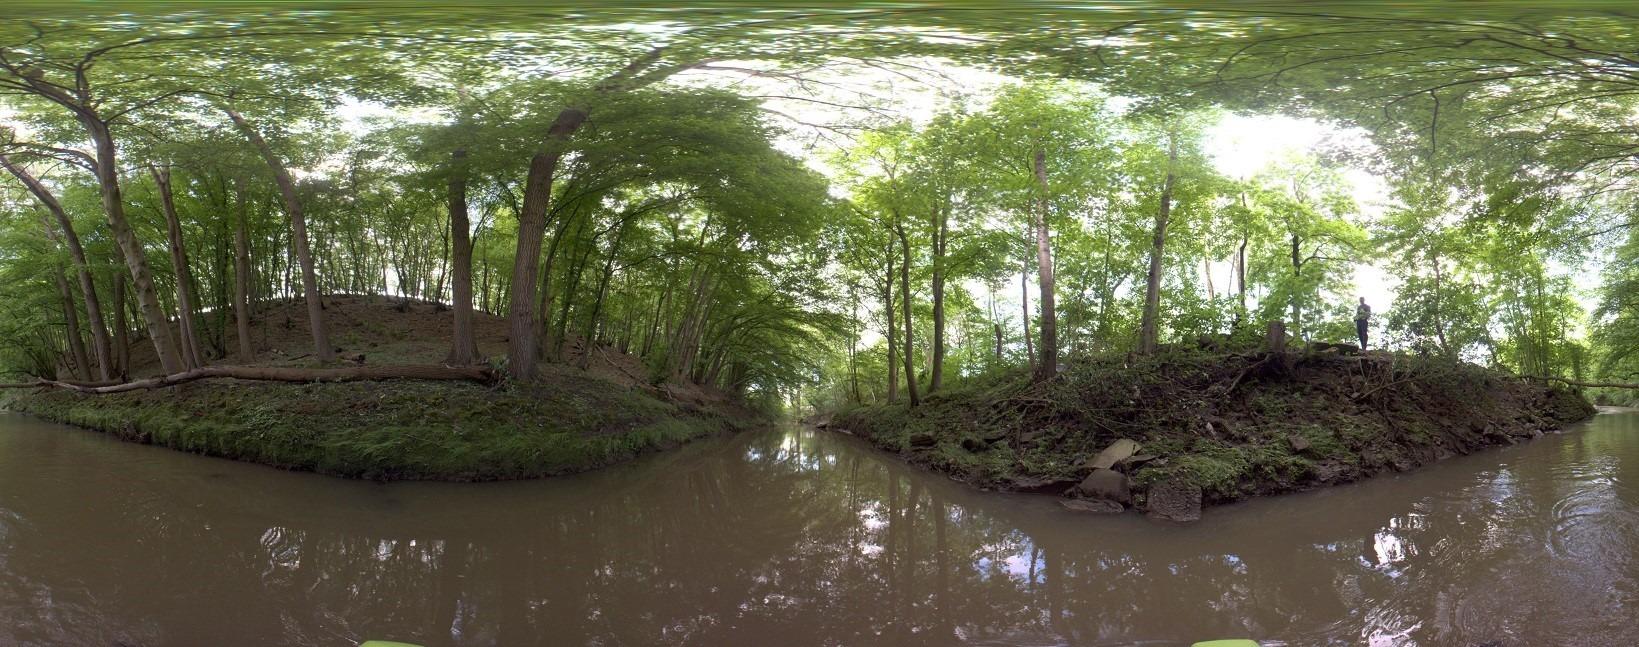 Panoramafoto Fluss